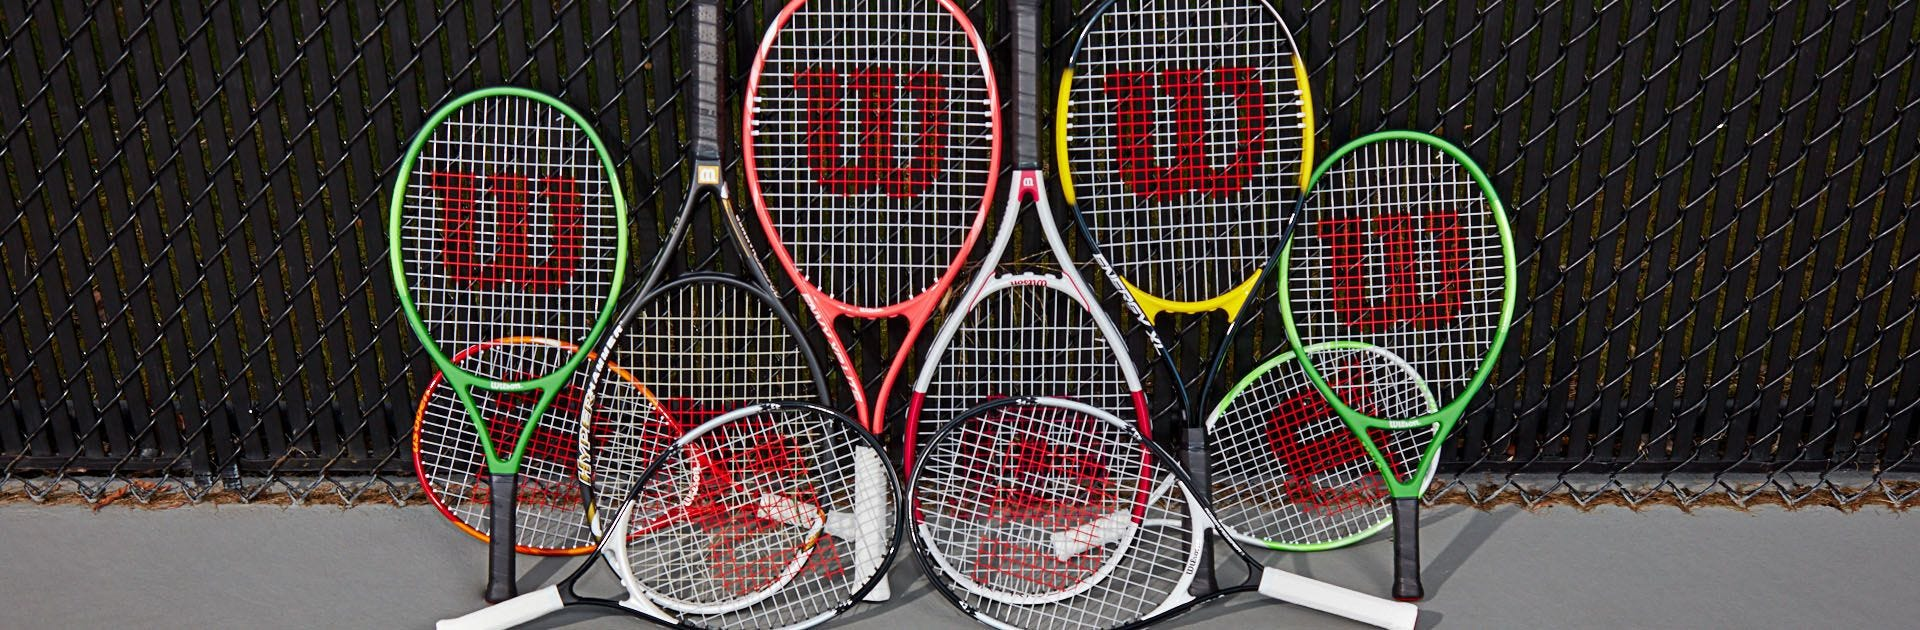 Full Range of Recreational Racquets